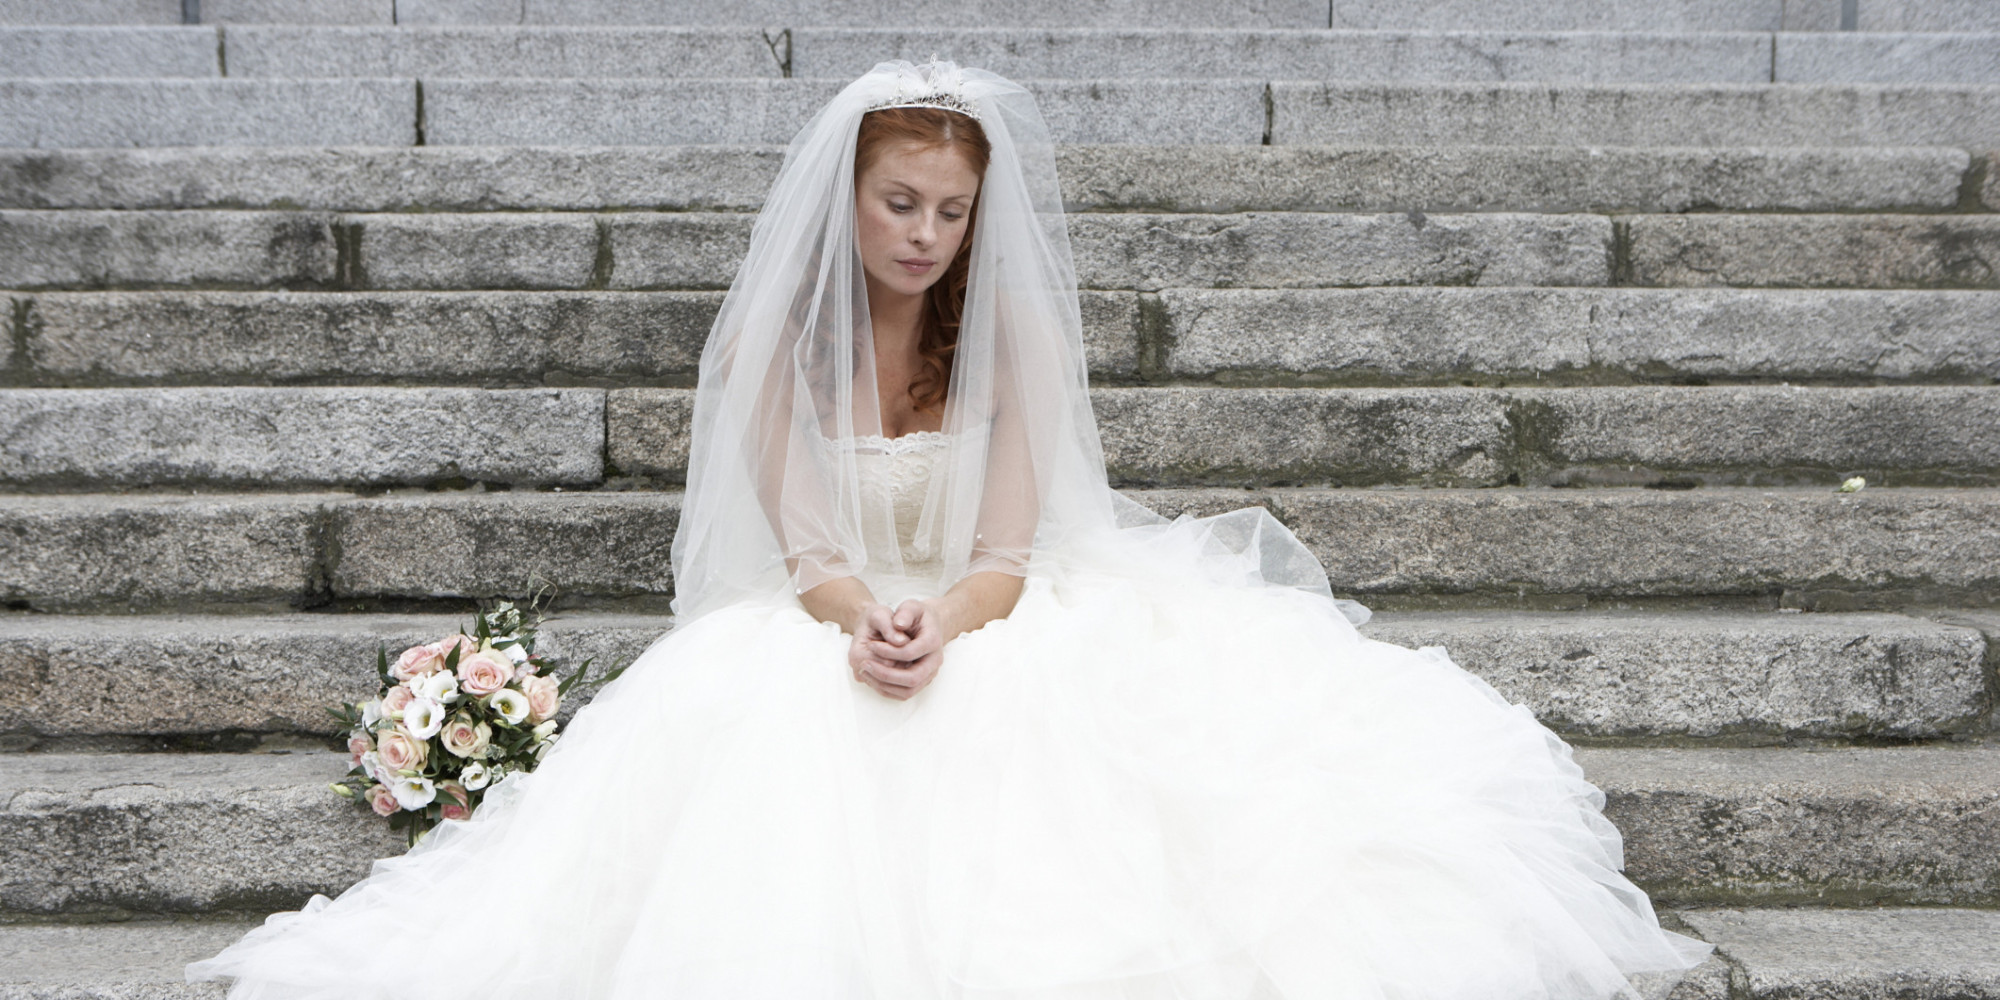 Sad marriages